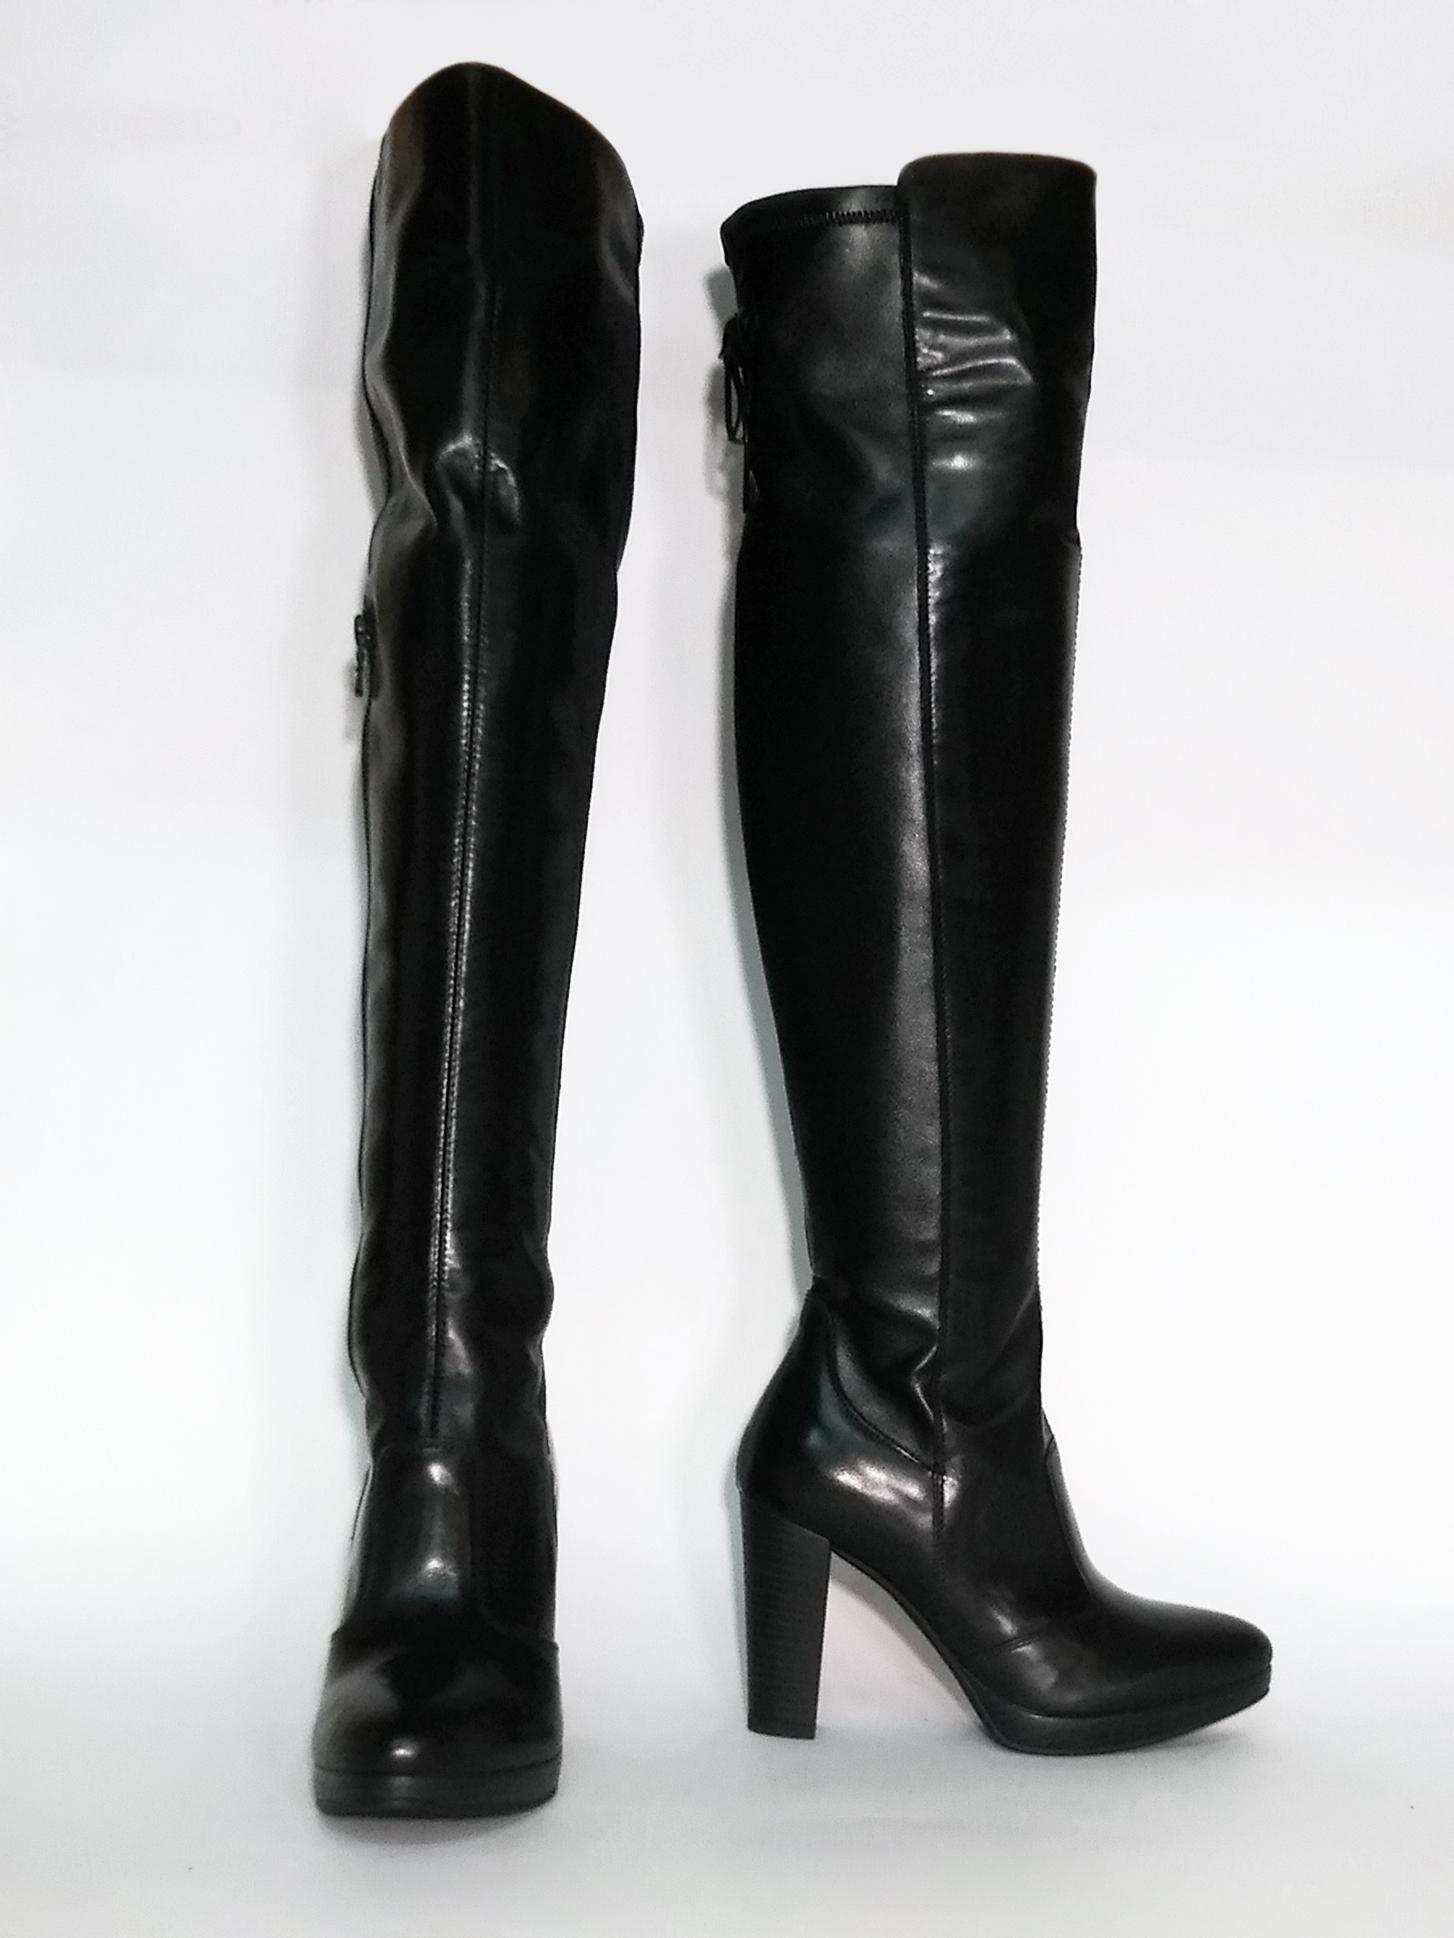 Stivale over-the-knee nero Nero Giardini